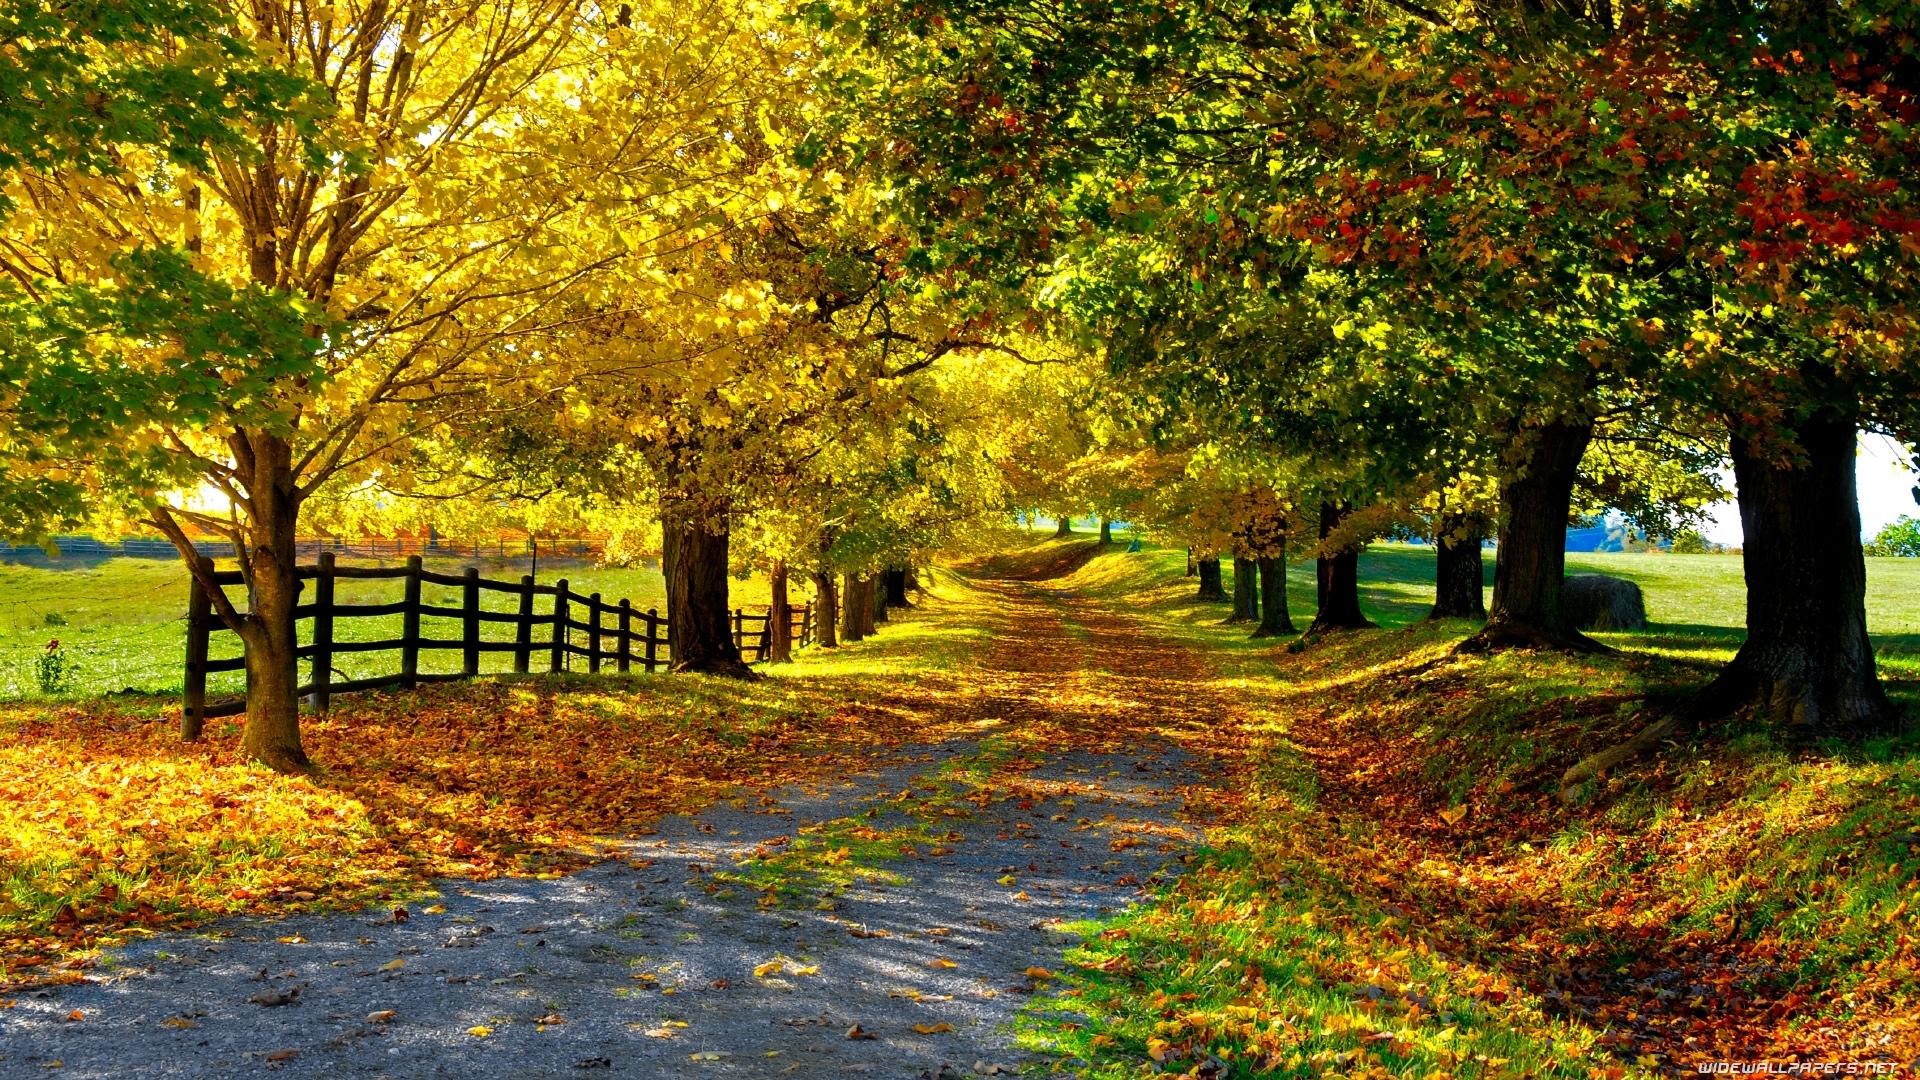 Wallpaper Nature HD